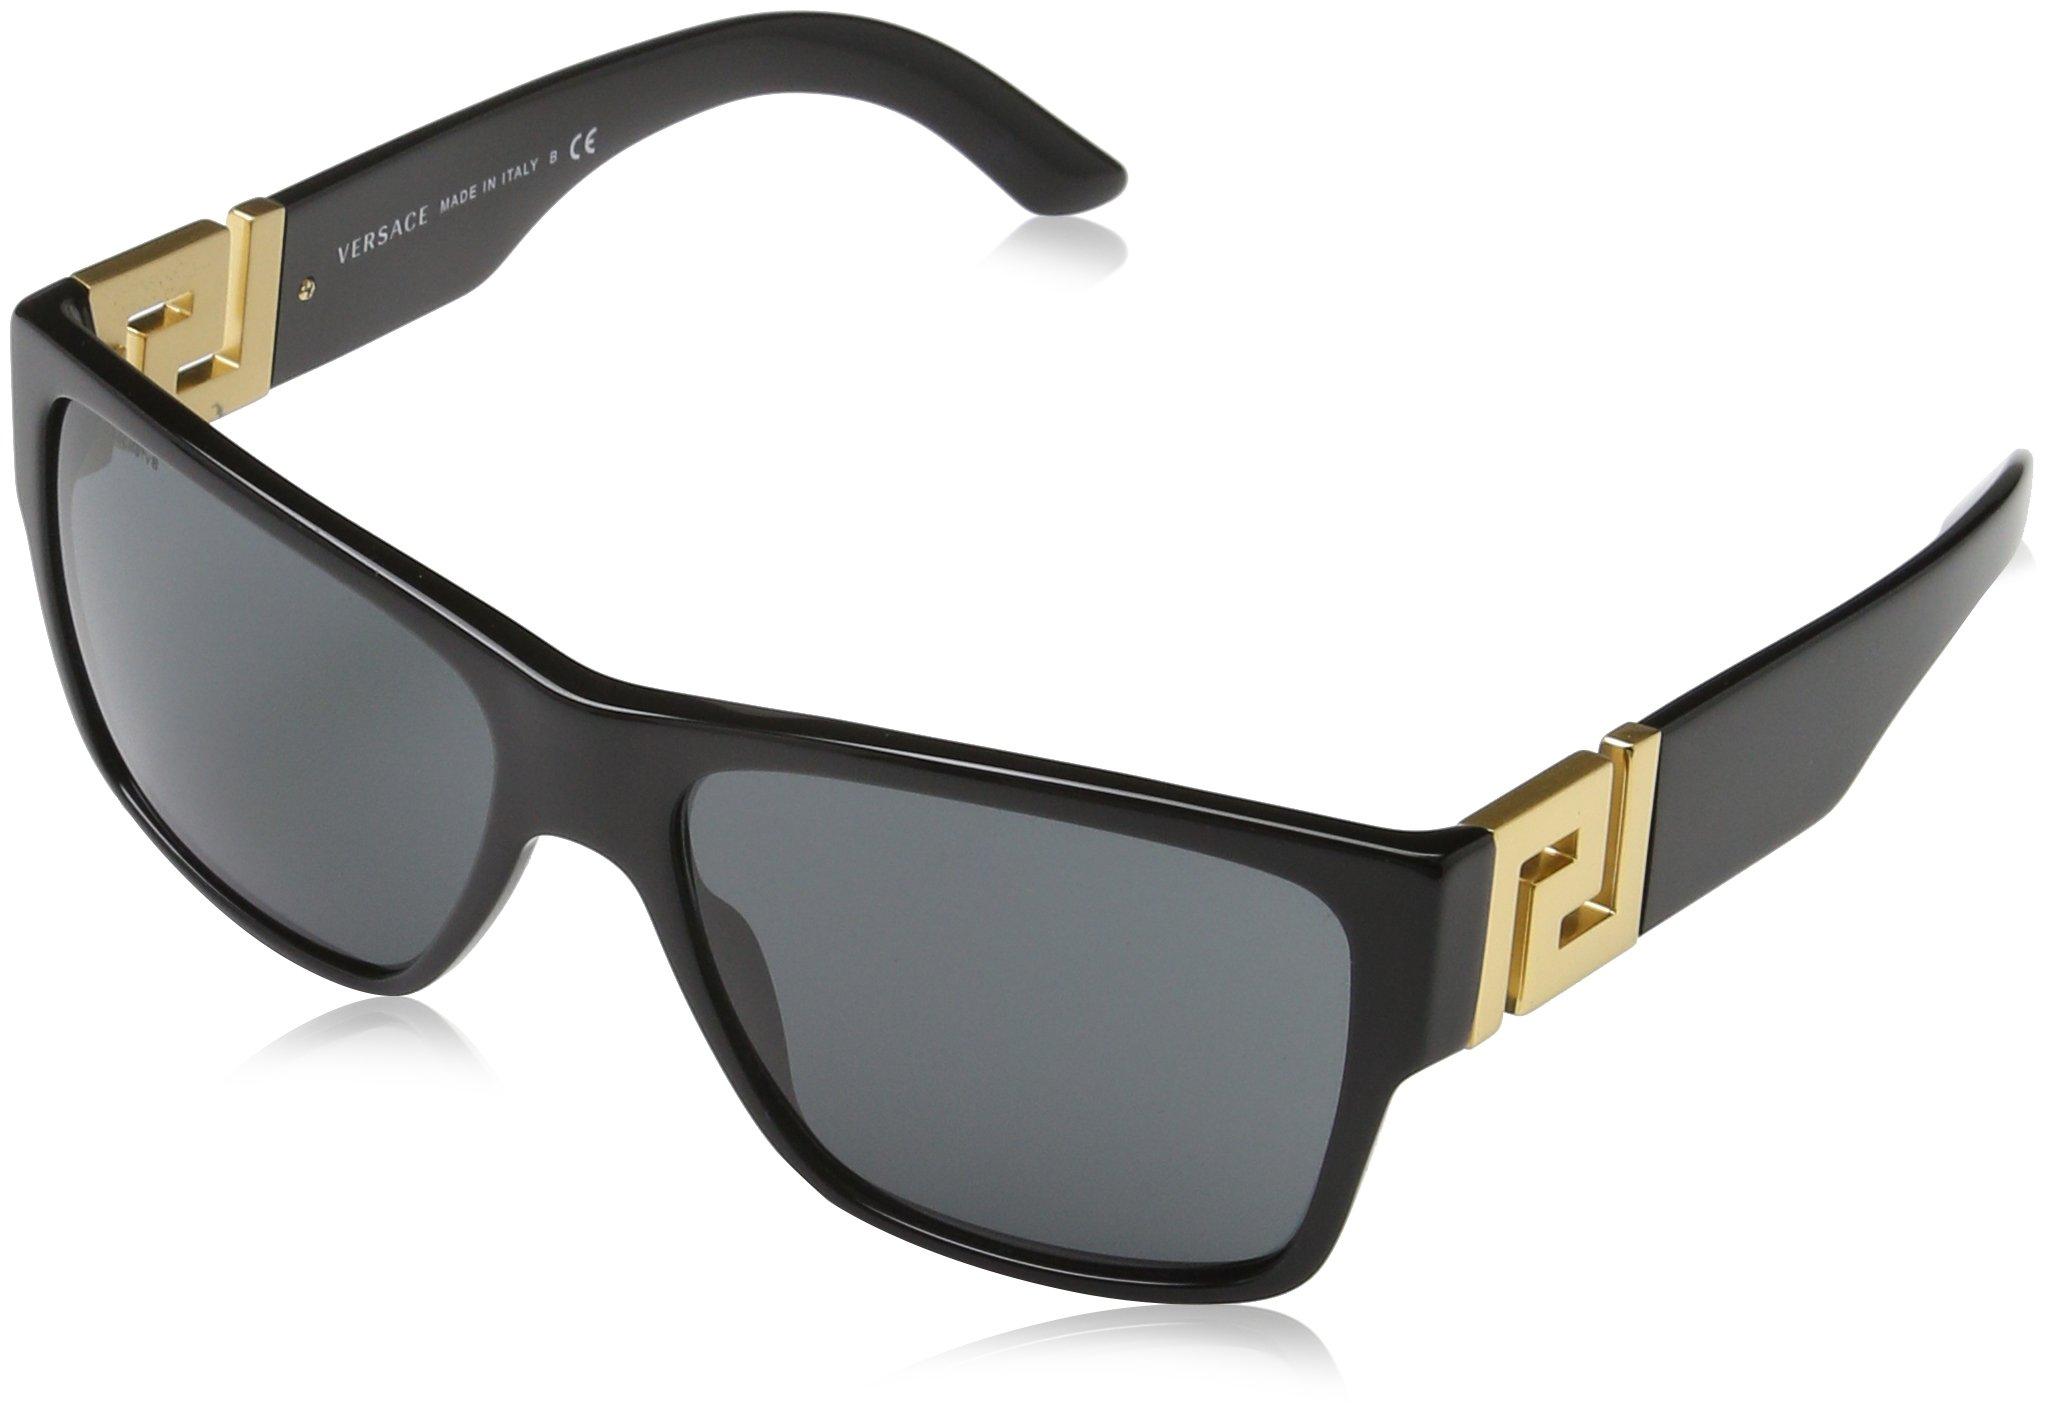 e2861650a24 Cheap Versace Sunglasses For Men